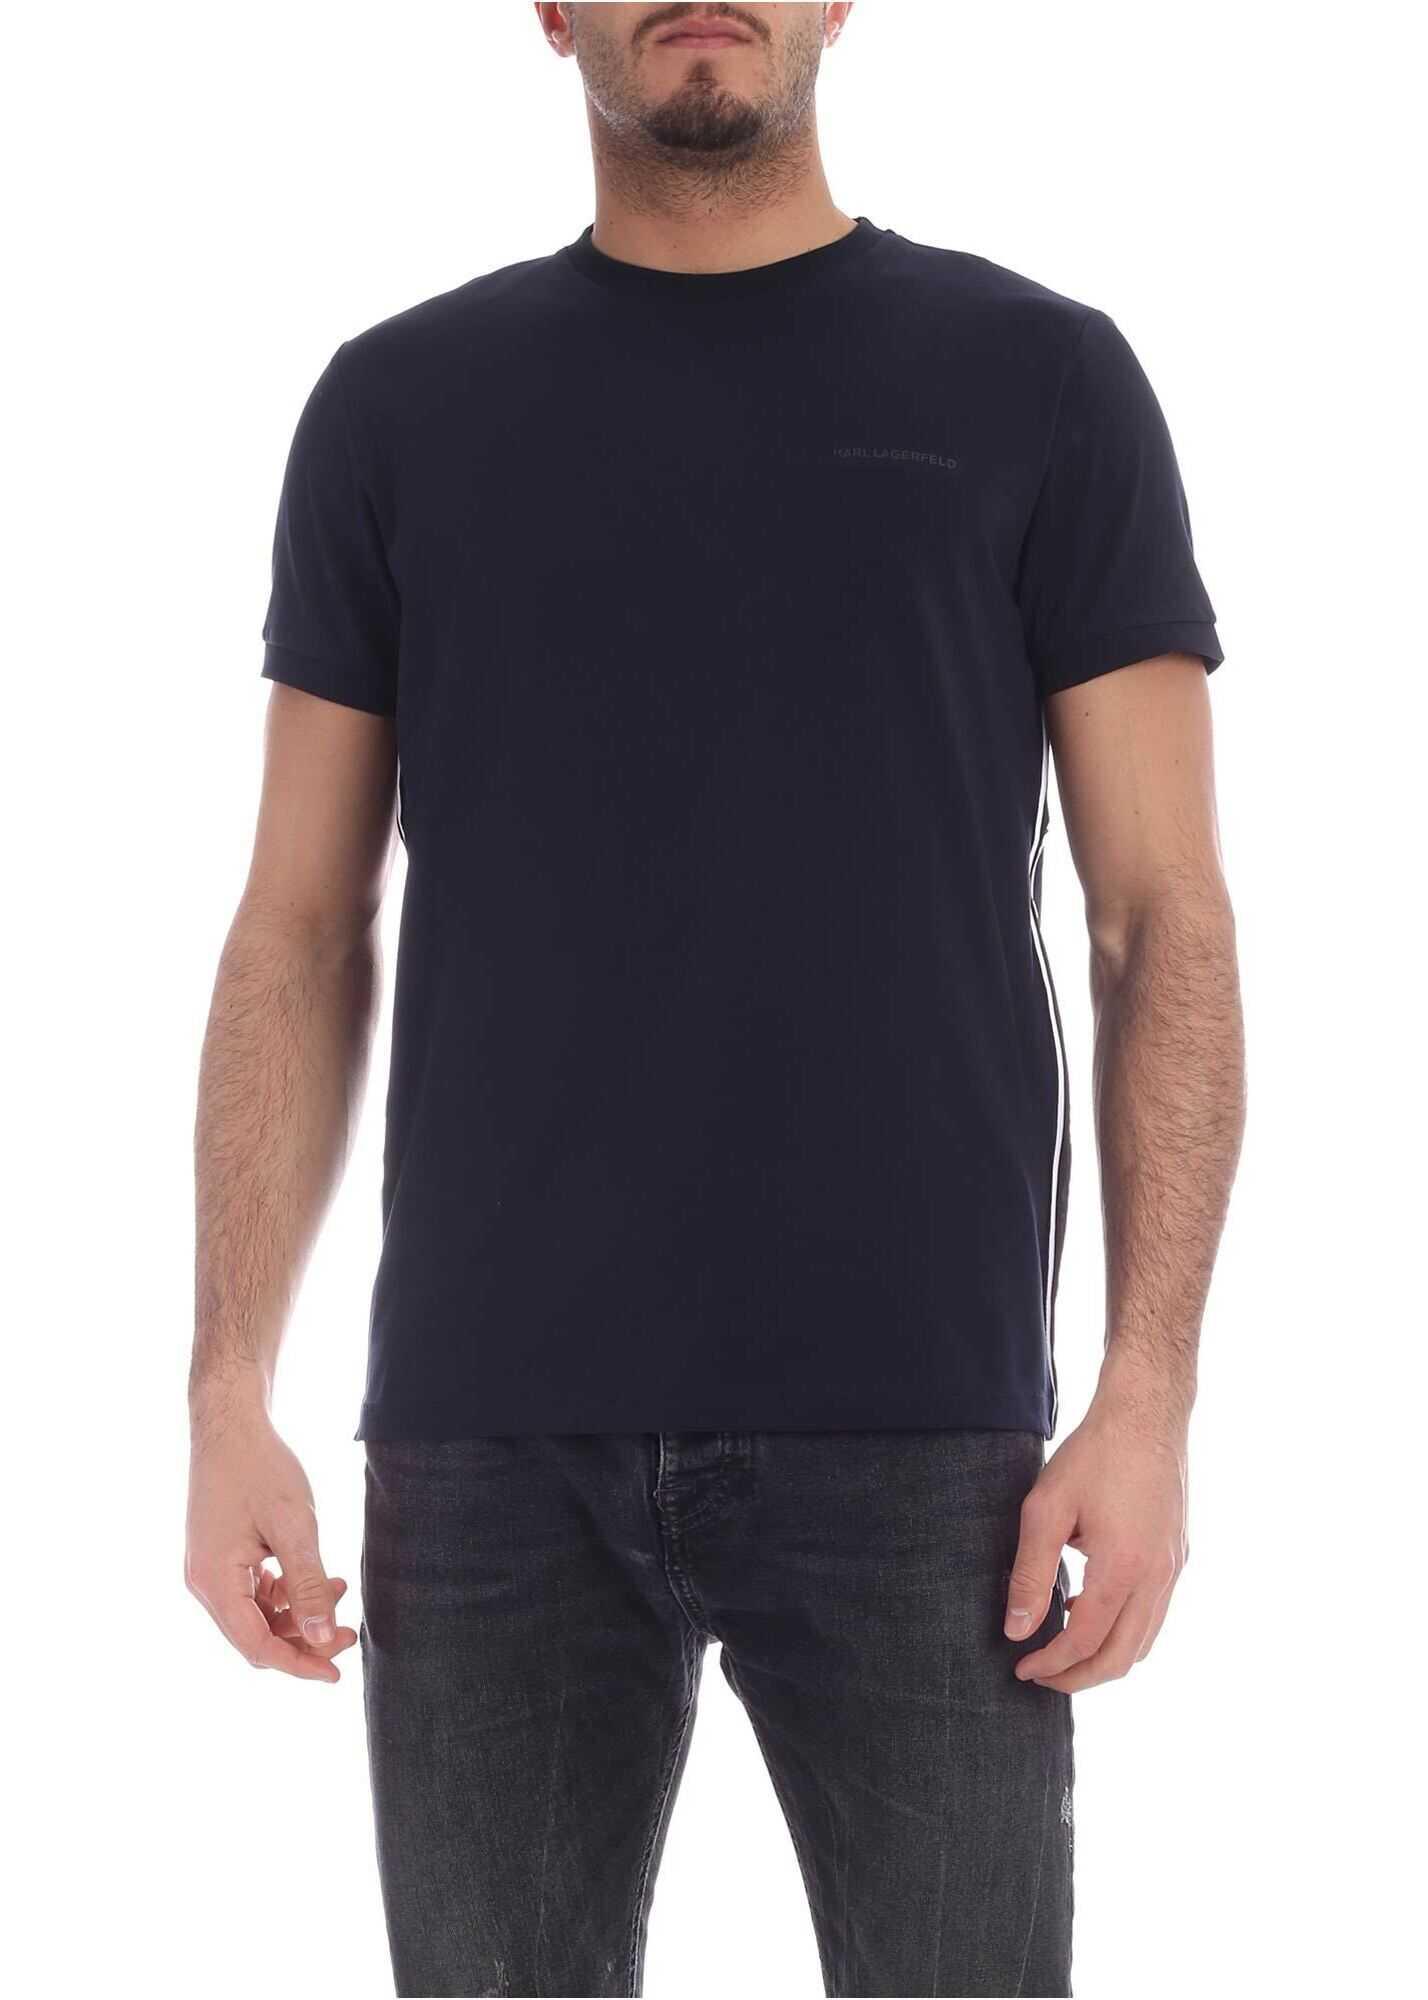 Karl Lagerfeld Branded Details T-Shirt In Blue Blue